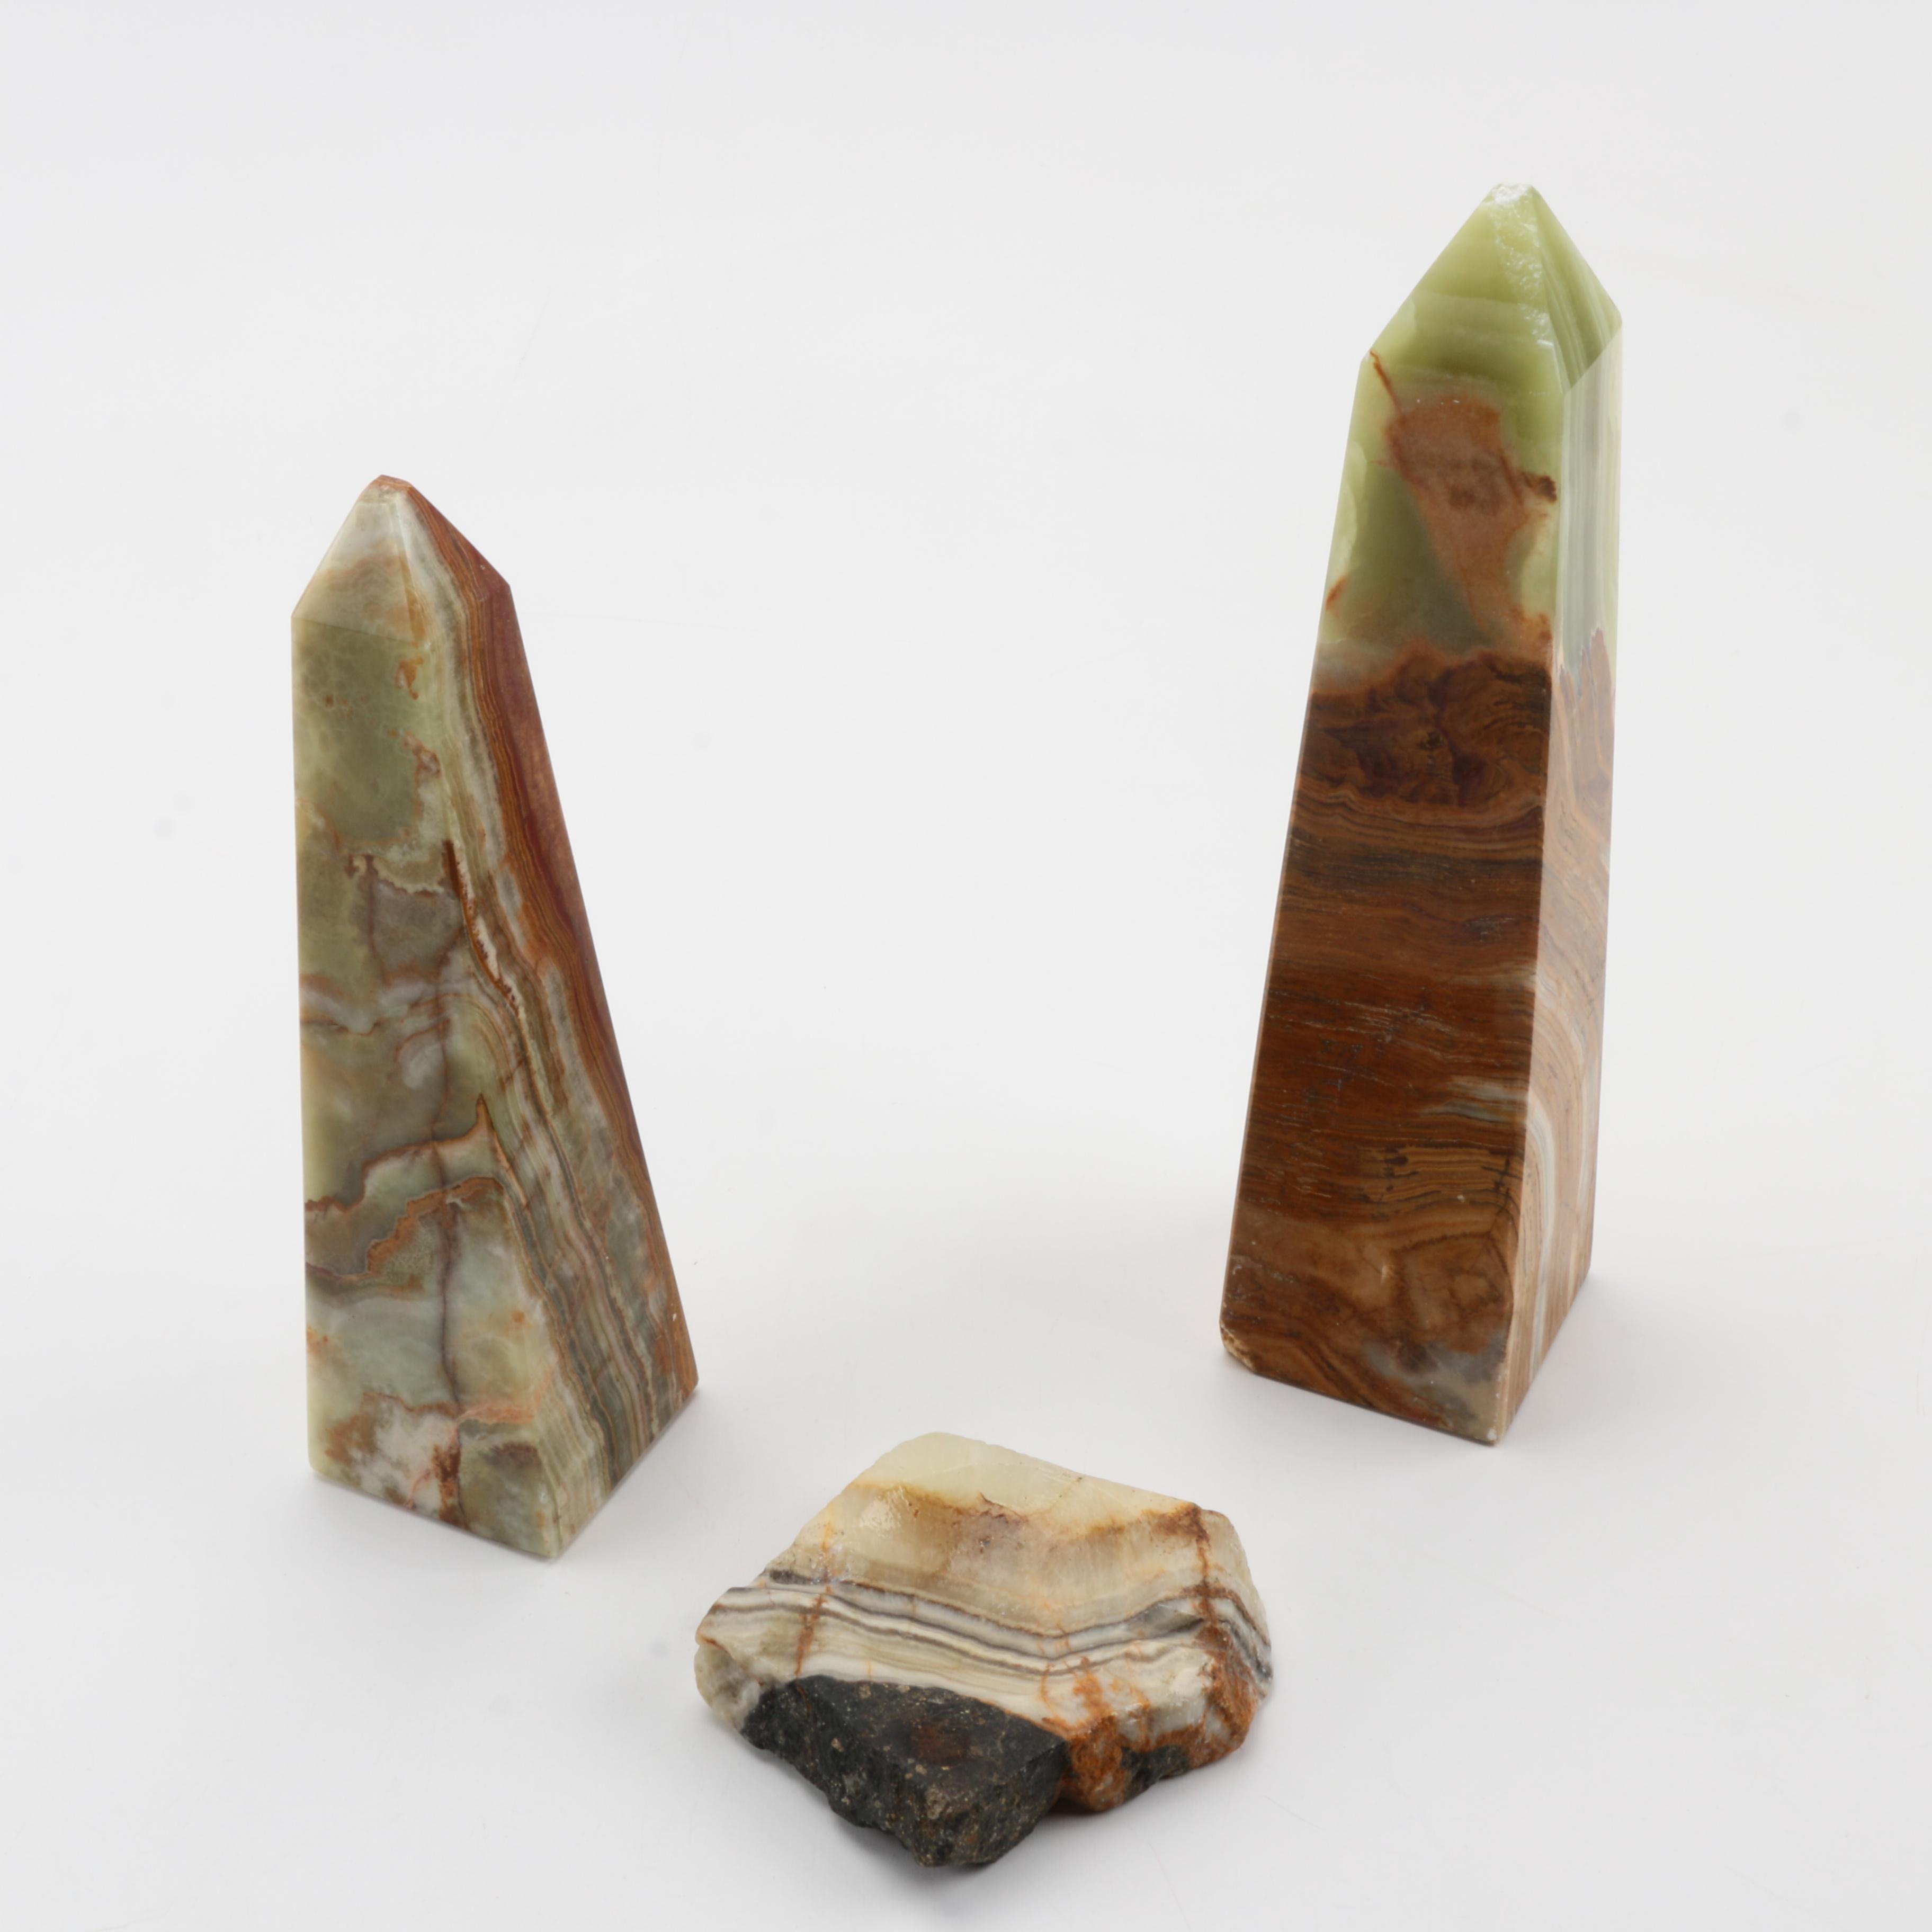 Agate Obelisks and Ash Tray